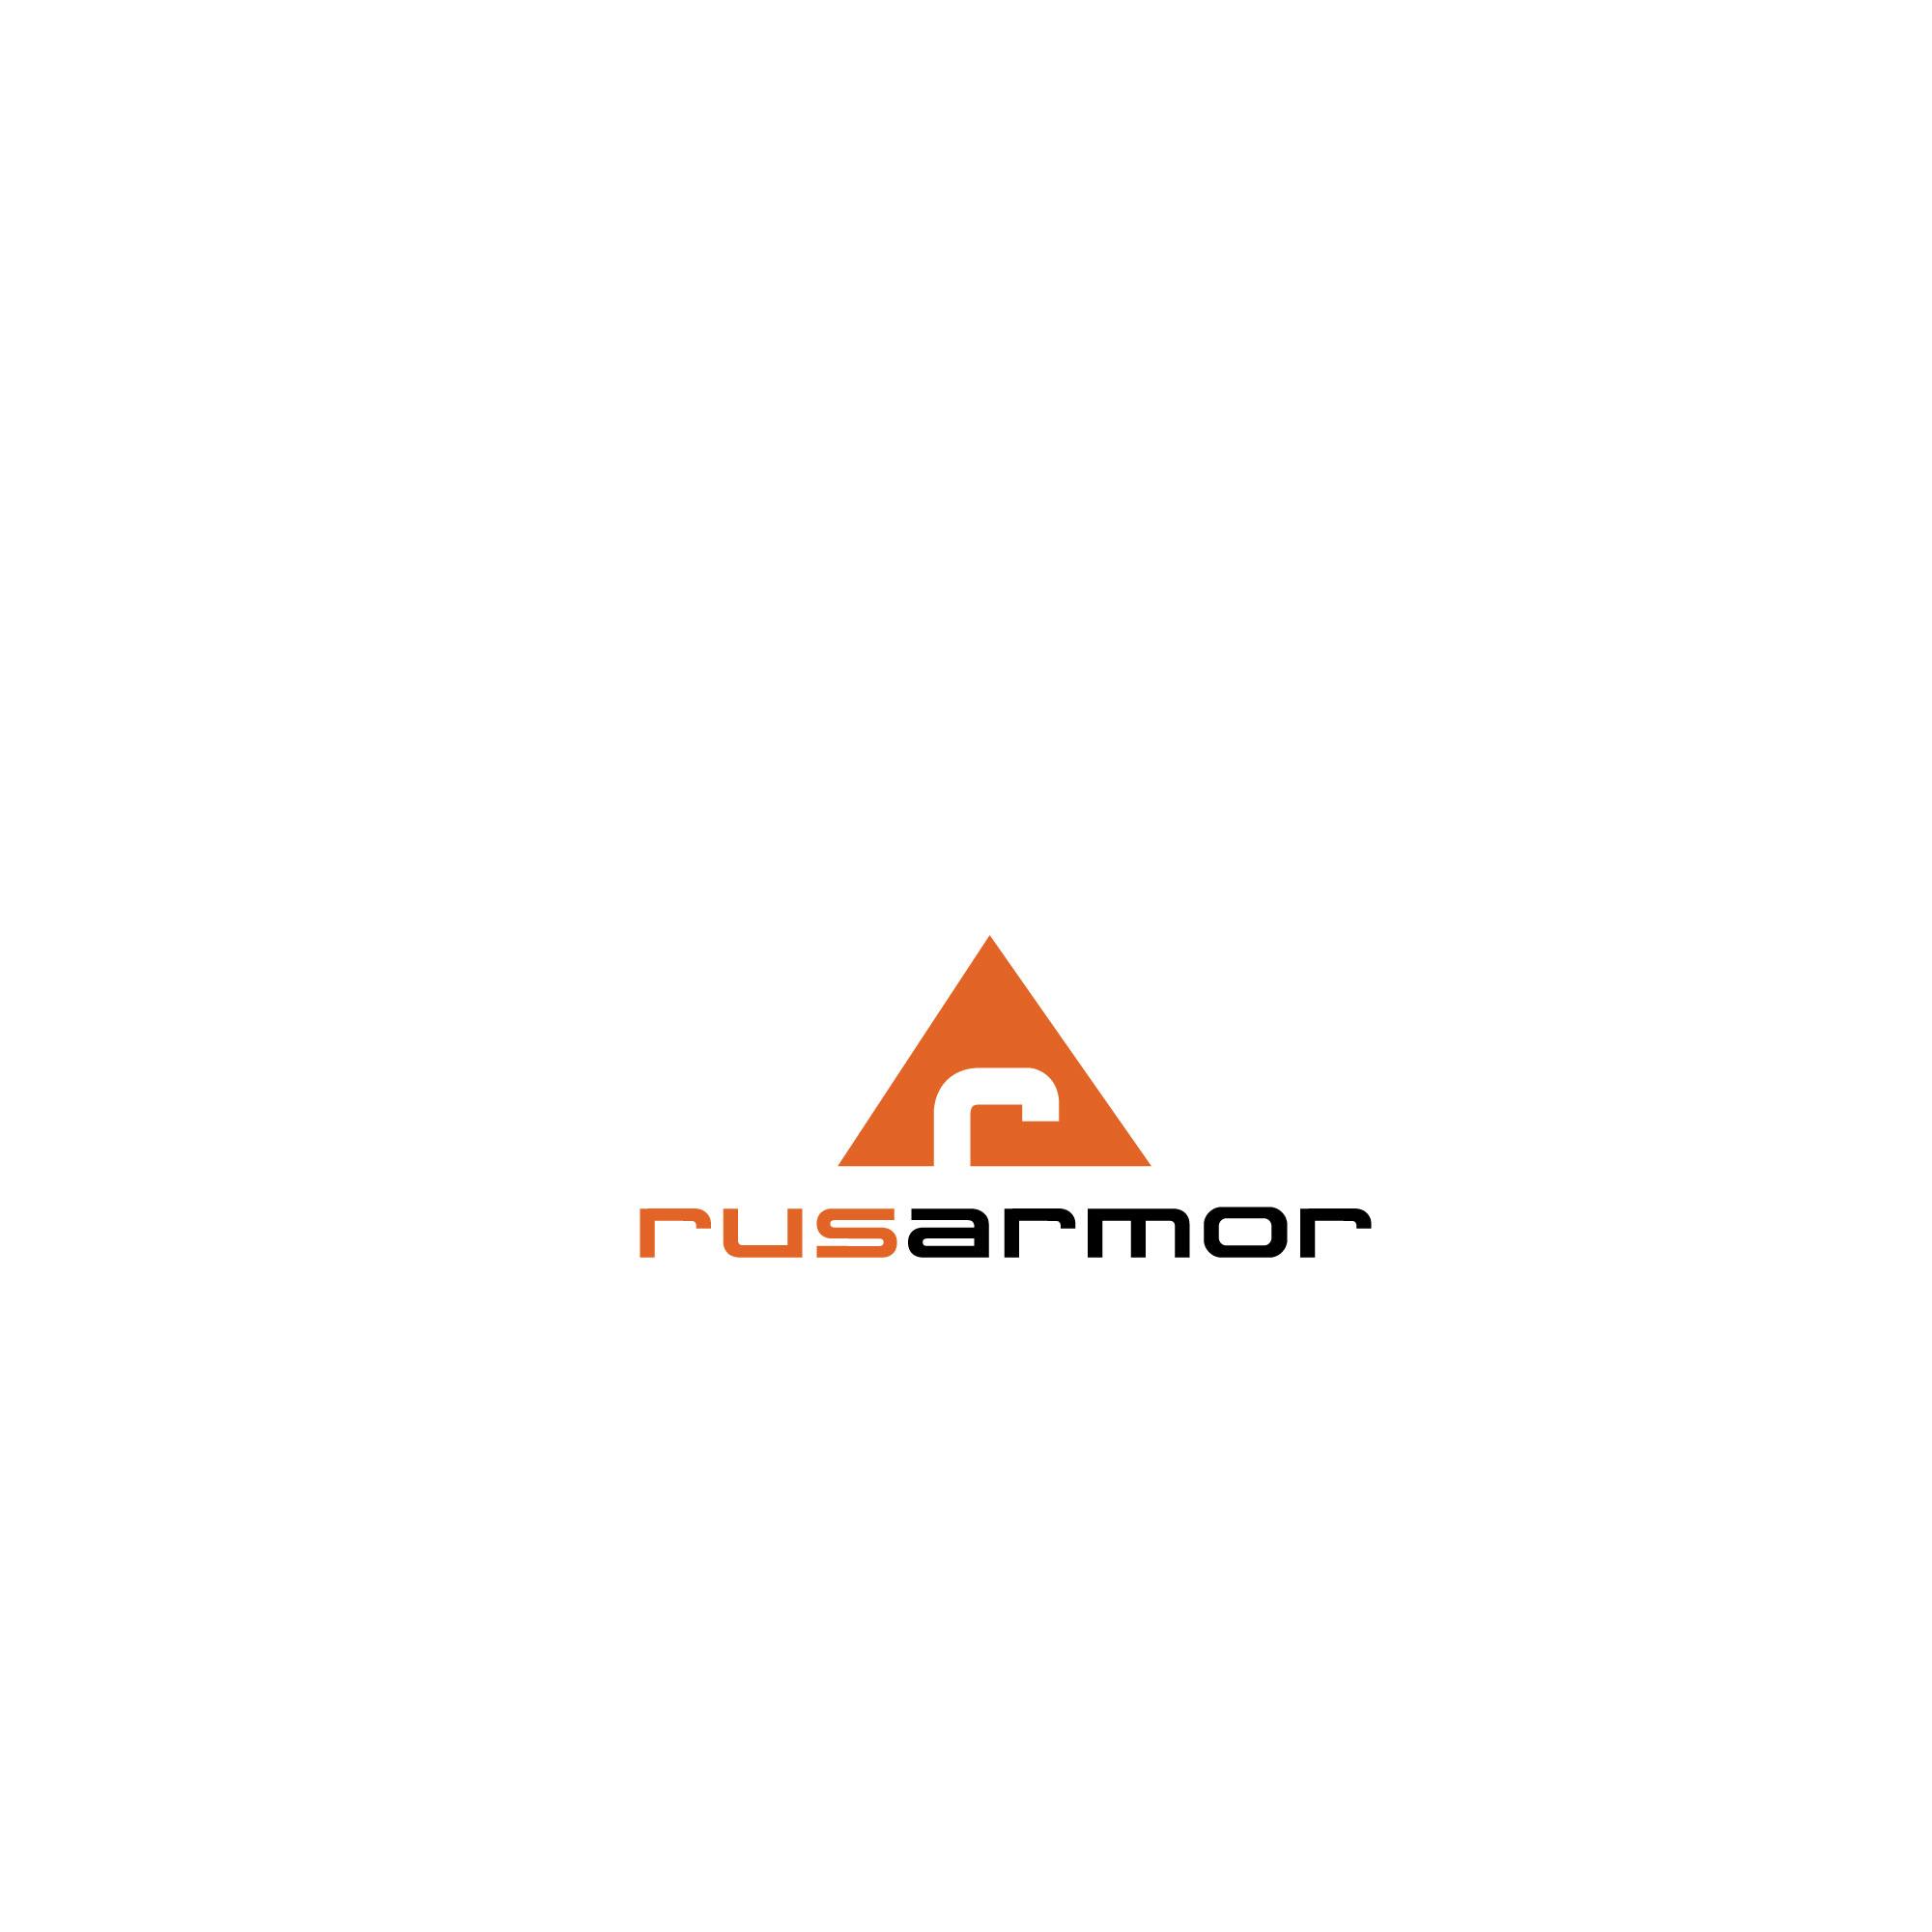 Разработка логотипа технологического стартапа РУСАРМОР фото f_2595a0aedd8d640f.jpg